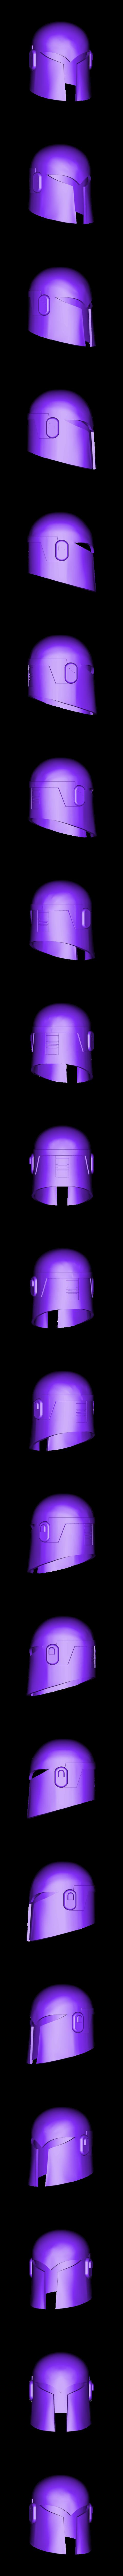 Sabine_Wren_Helmet_v3.stl Download free STL file Sabine Wren Helmet Star Wars • Model to 3D print, VillainousPropShop